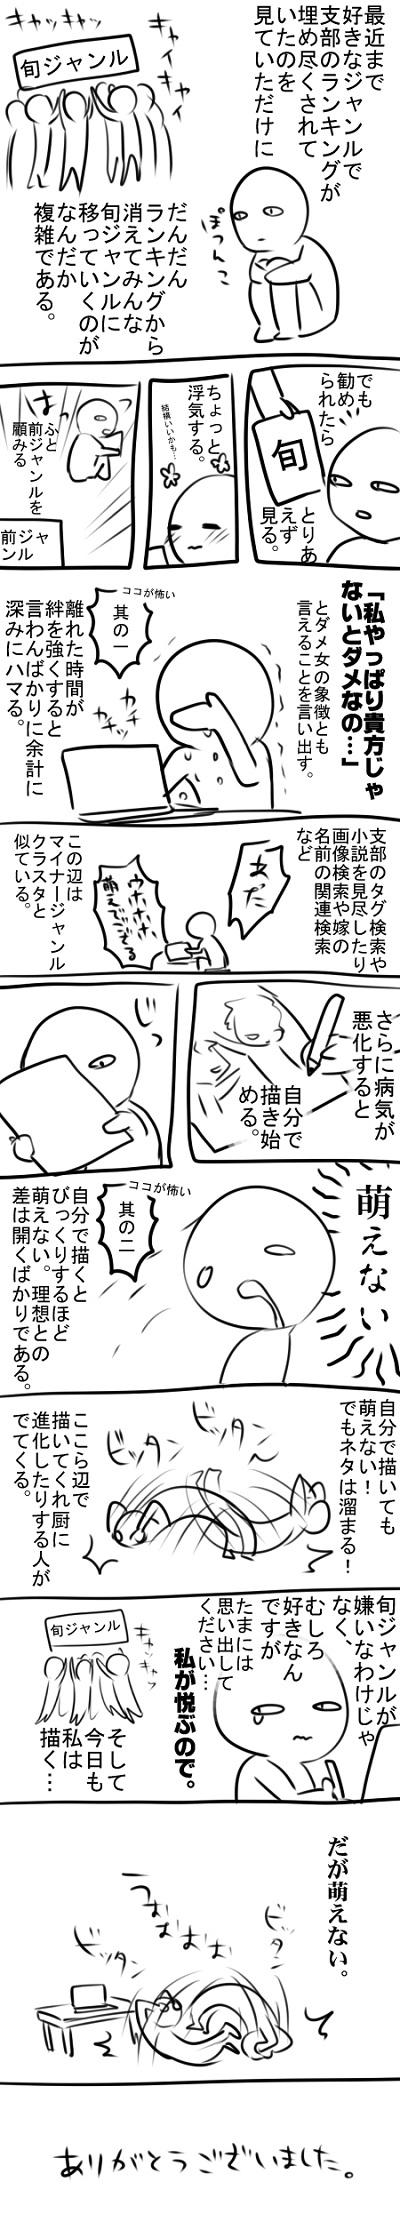 p_20120726185846.jpg